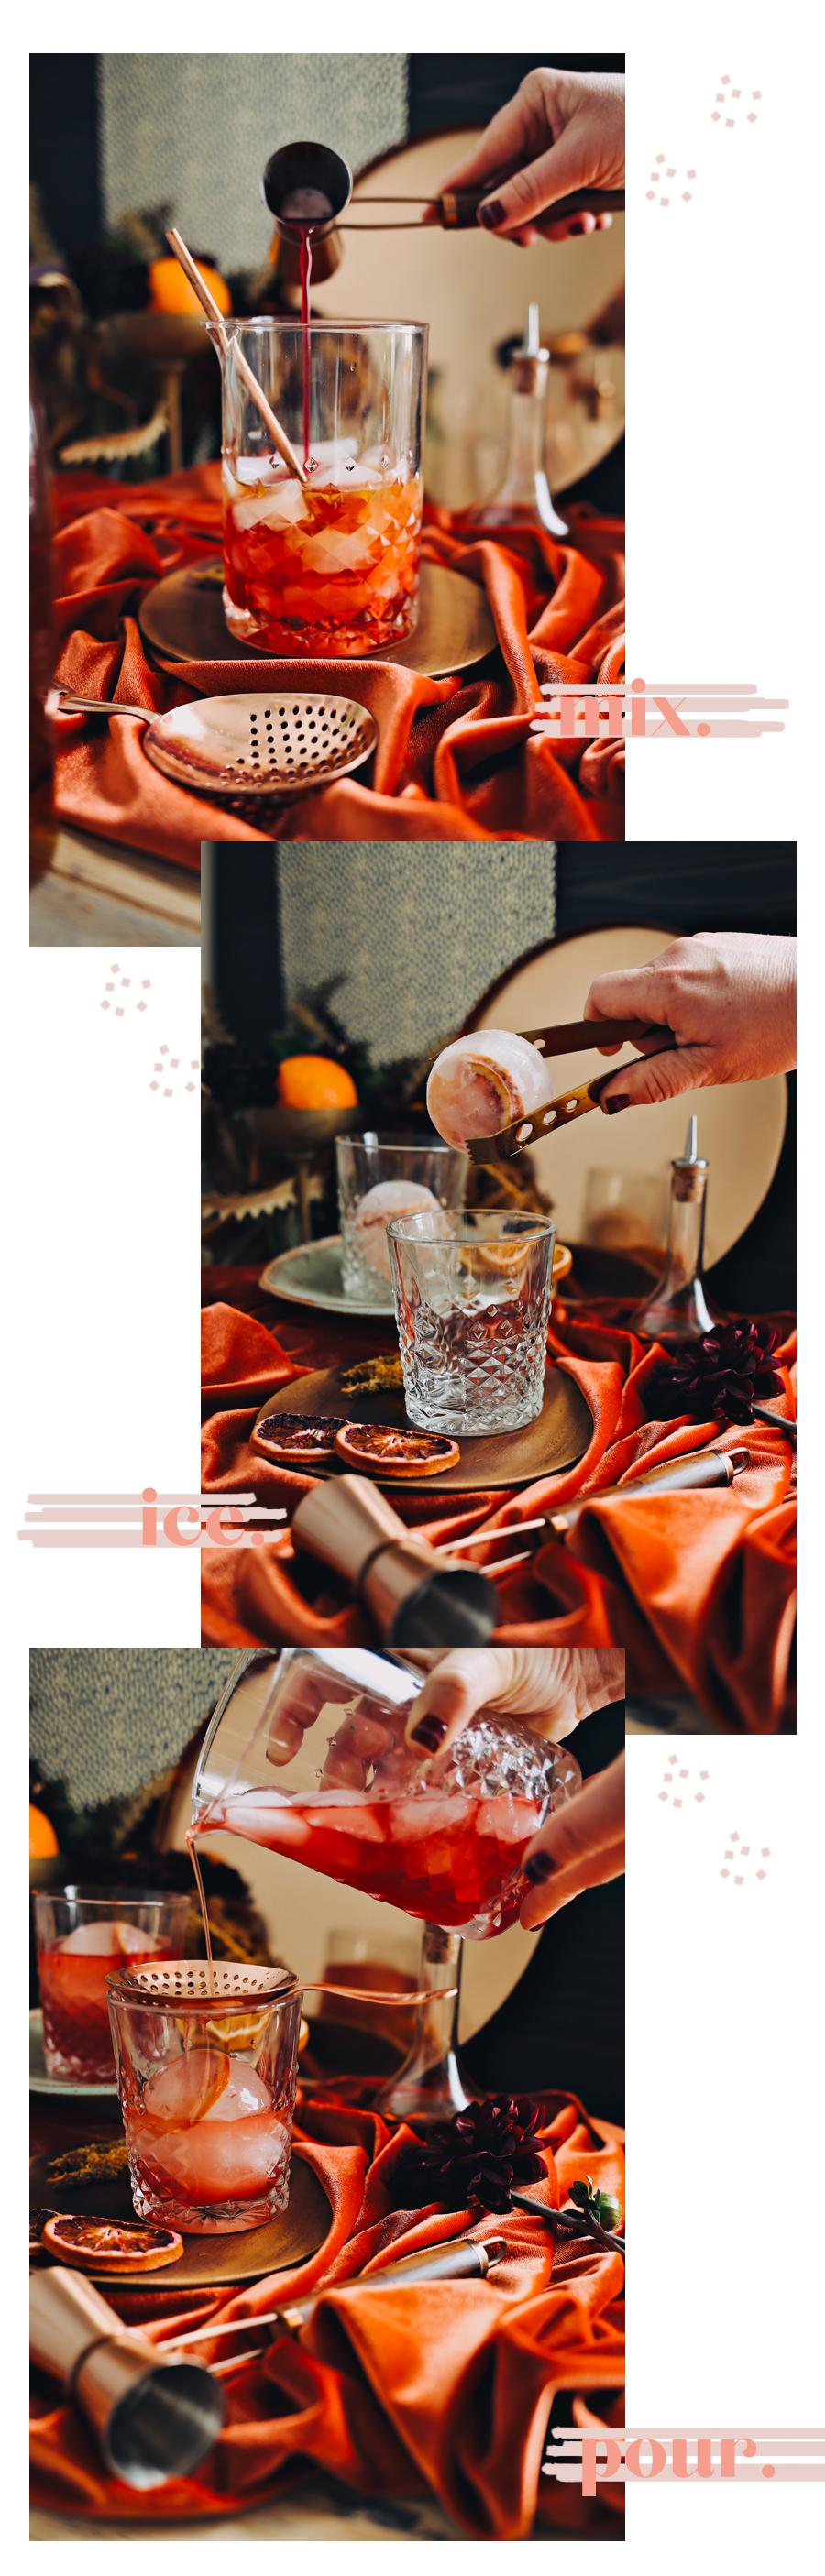 02_Smoked-Blood-Orange-Boulevardier-Dine-X-Design.jpg